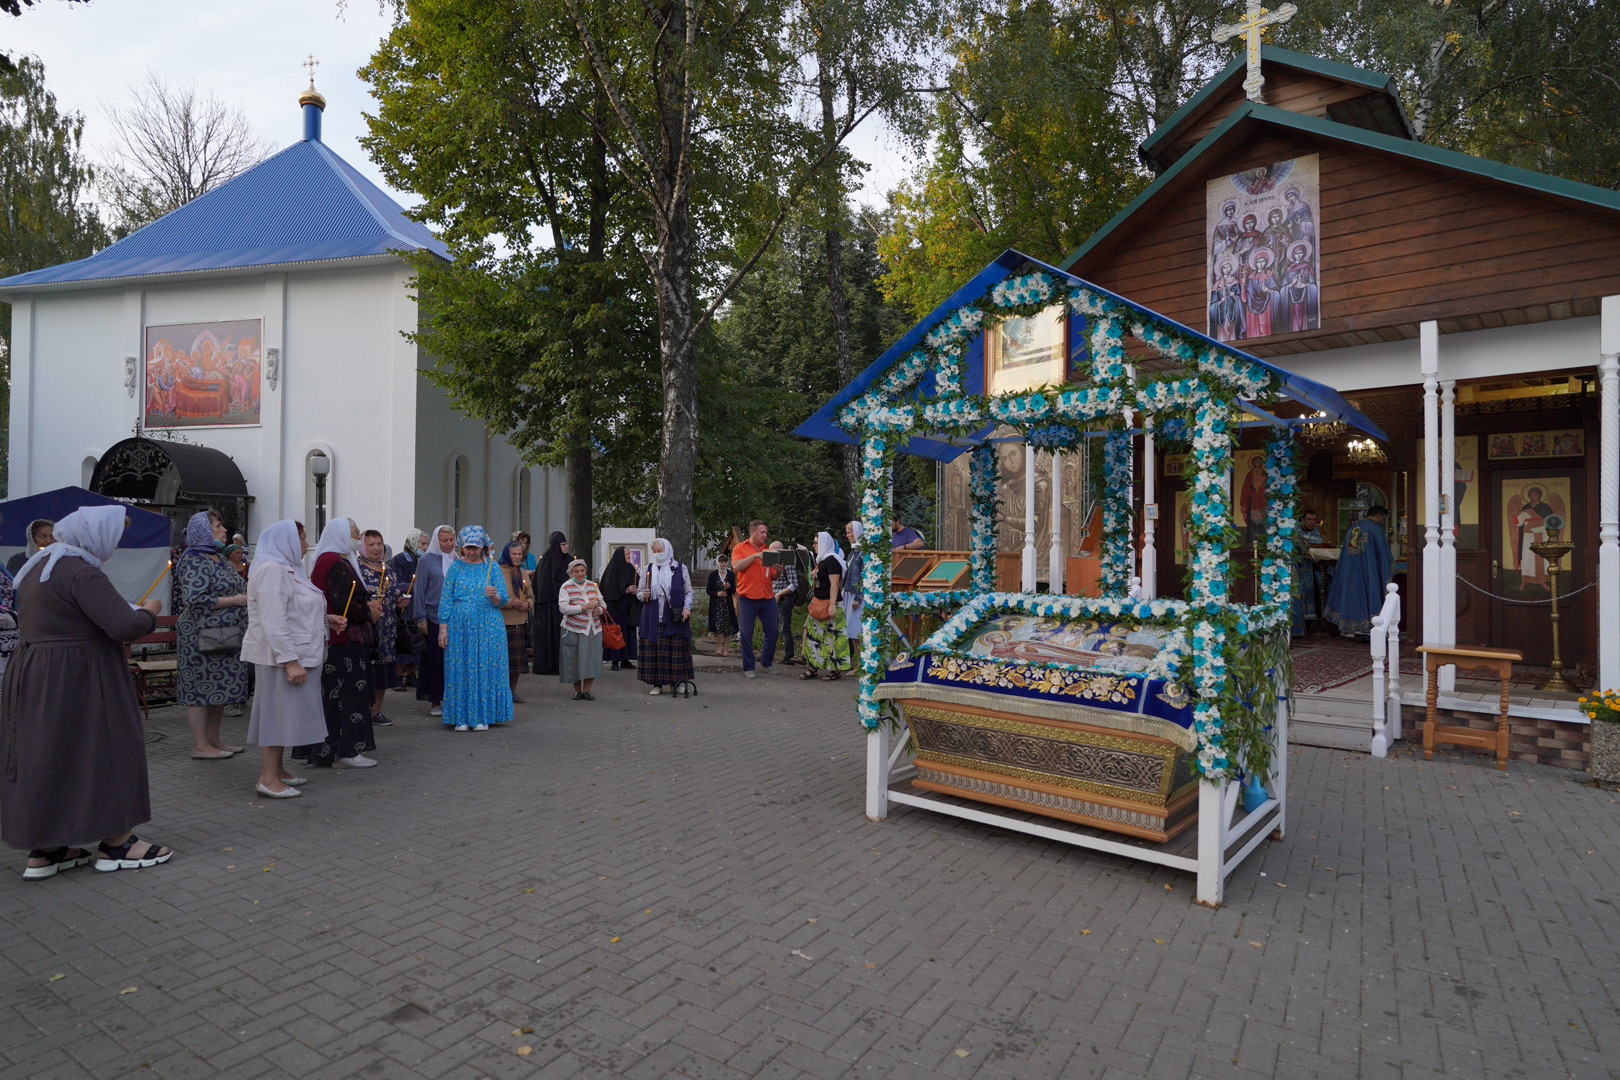 http://monuspen.ru/photoreports/eb9de00e1f5615849ea00b127bfcb98w.jpg